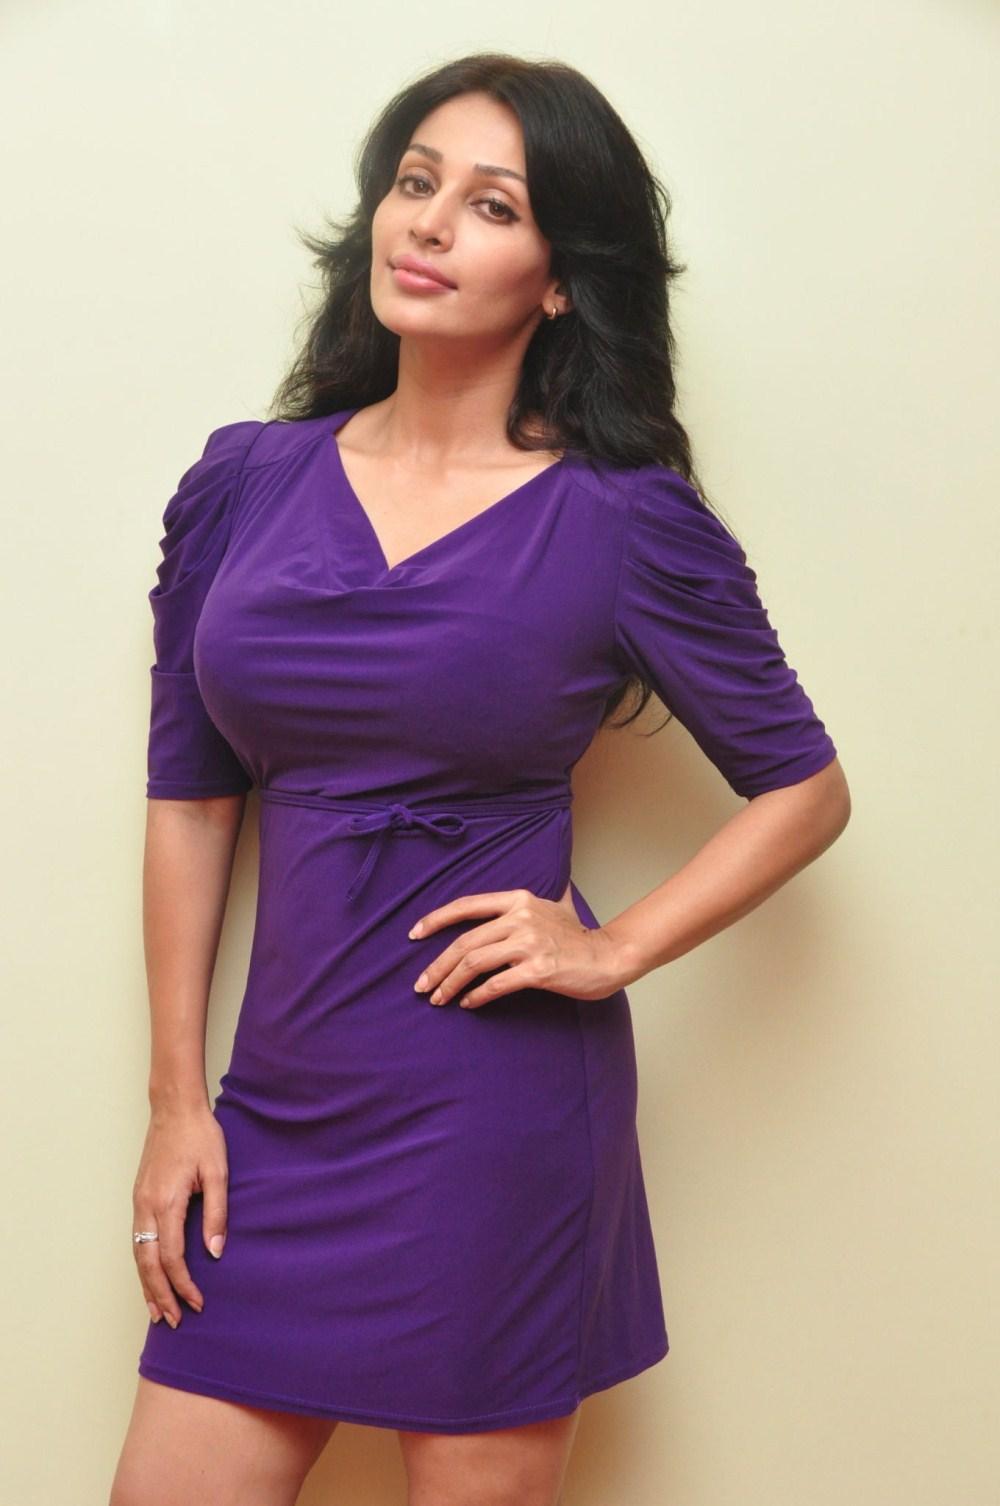 Flora Asha Saini Latest Stills 25cineframes